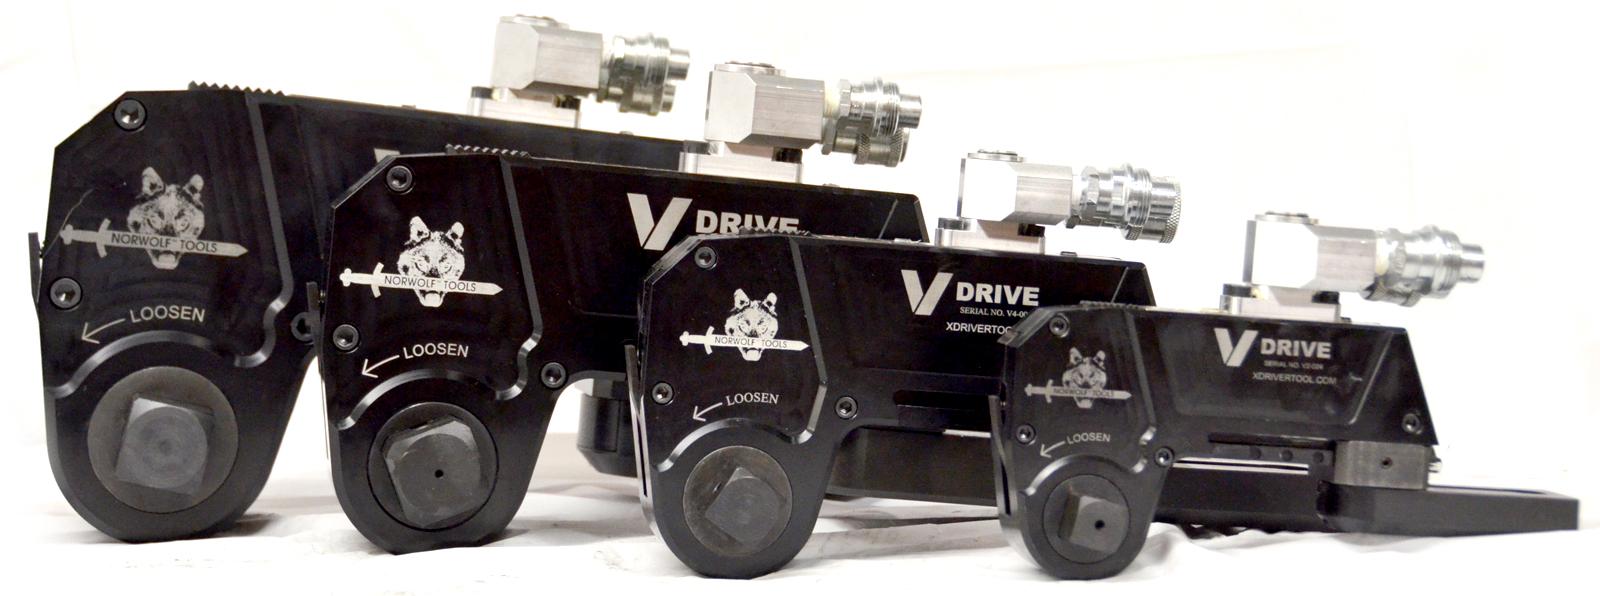 V-Drives-hdr1